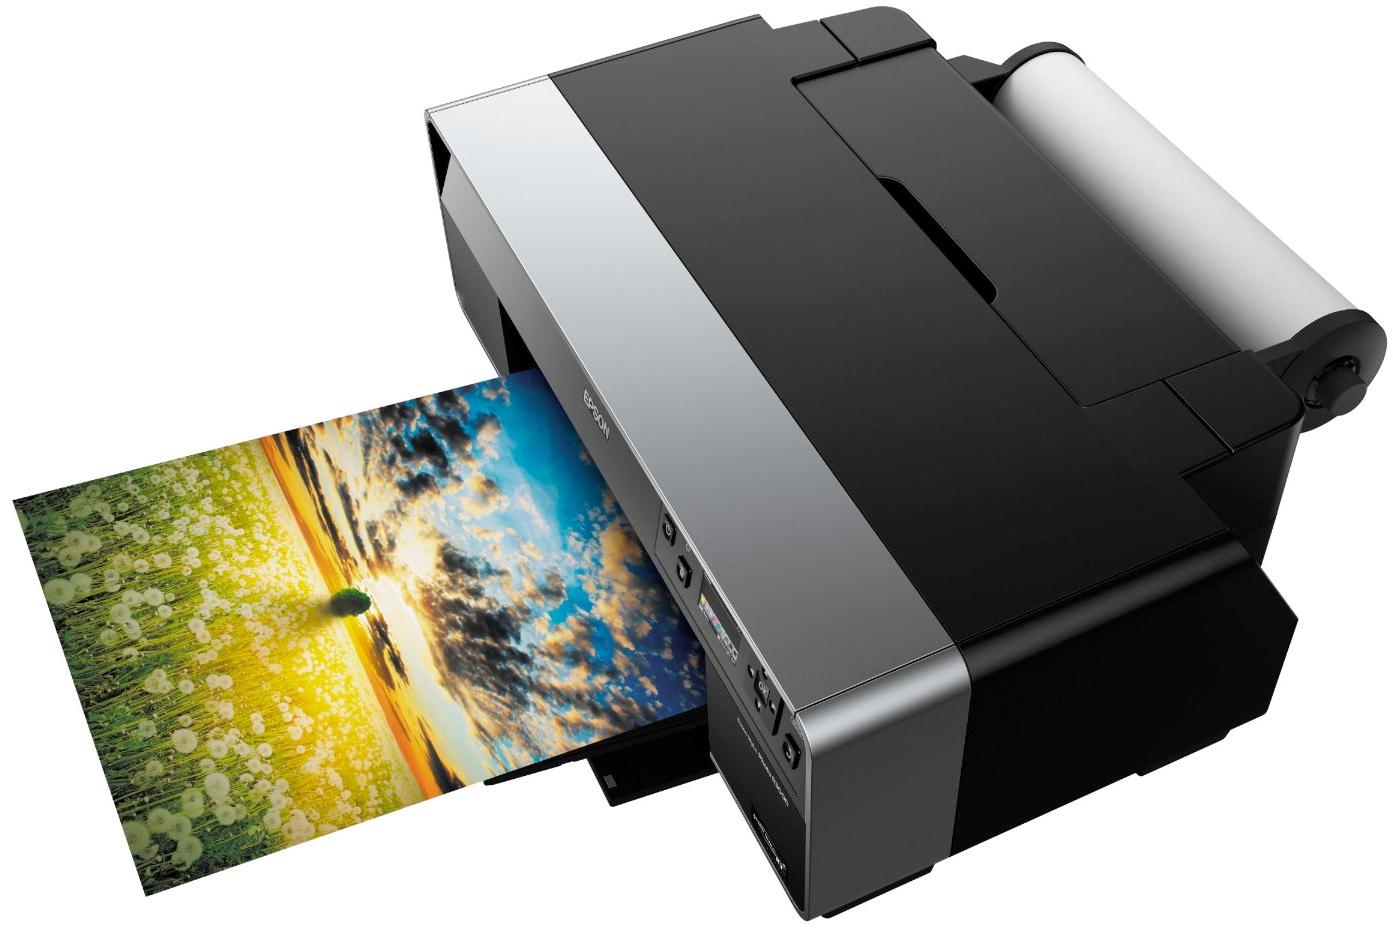 Printing With The Epson Stylus Photo R3000 Bh Explora